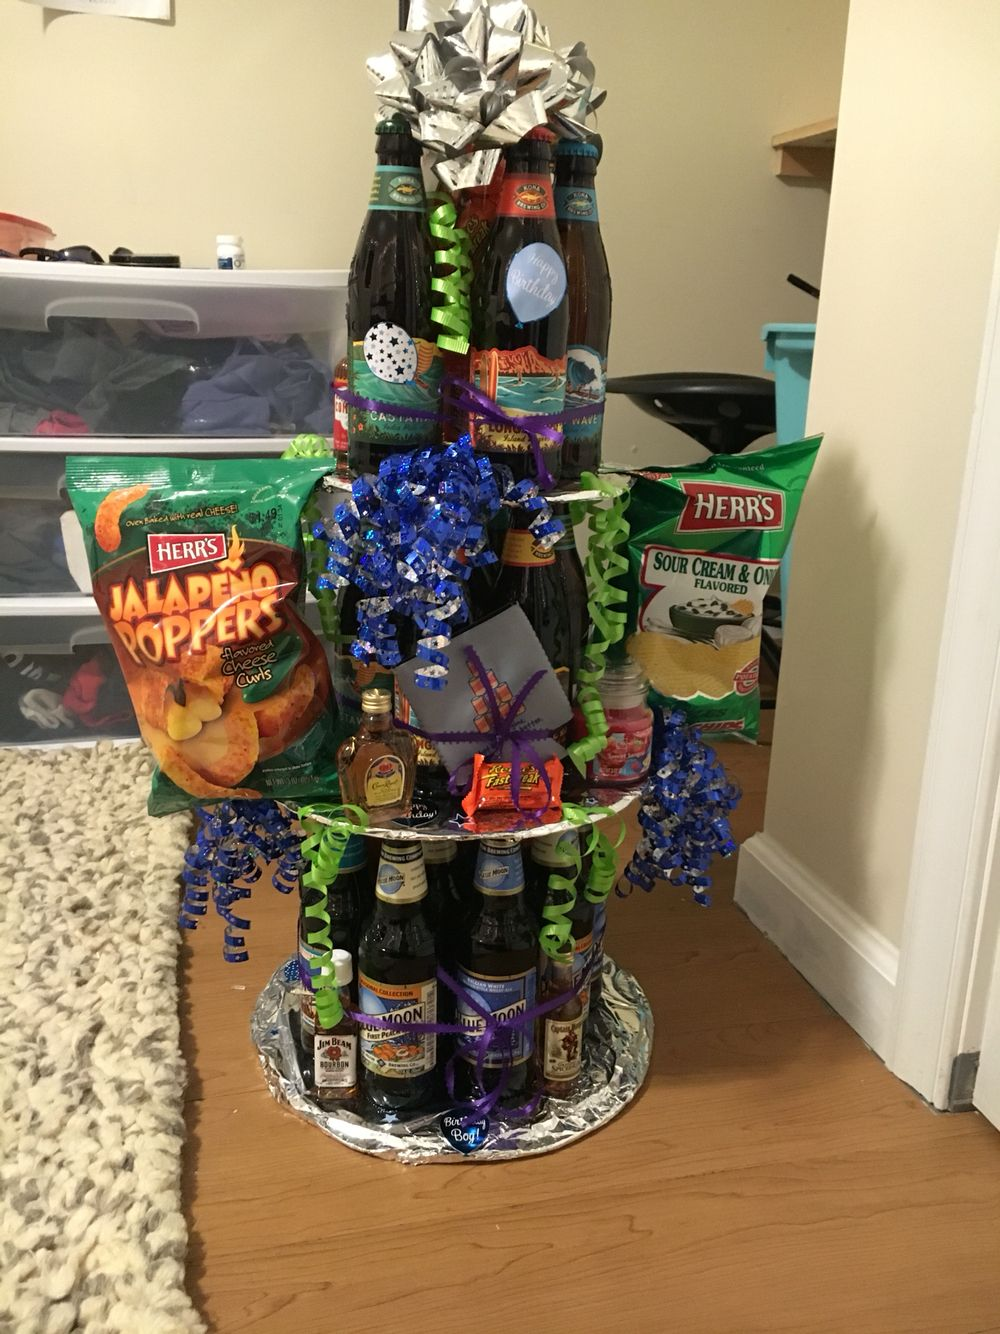 44+ Sour craft beer gift information